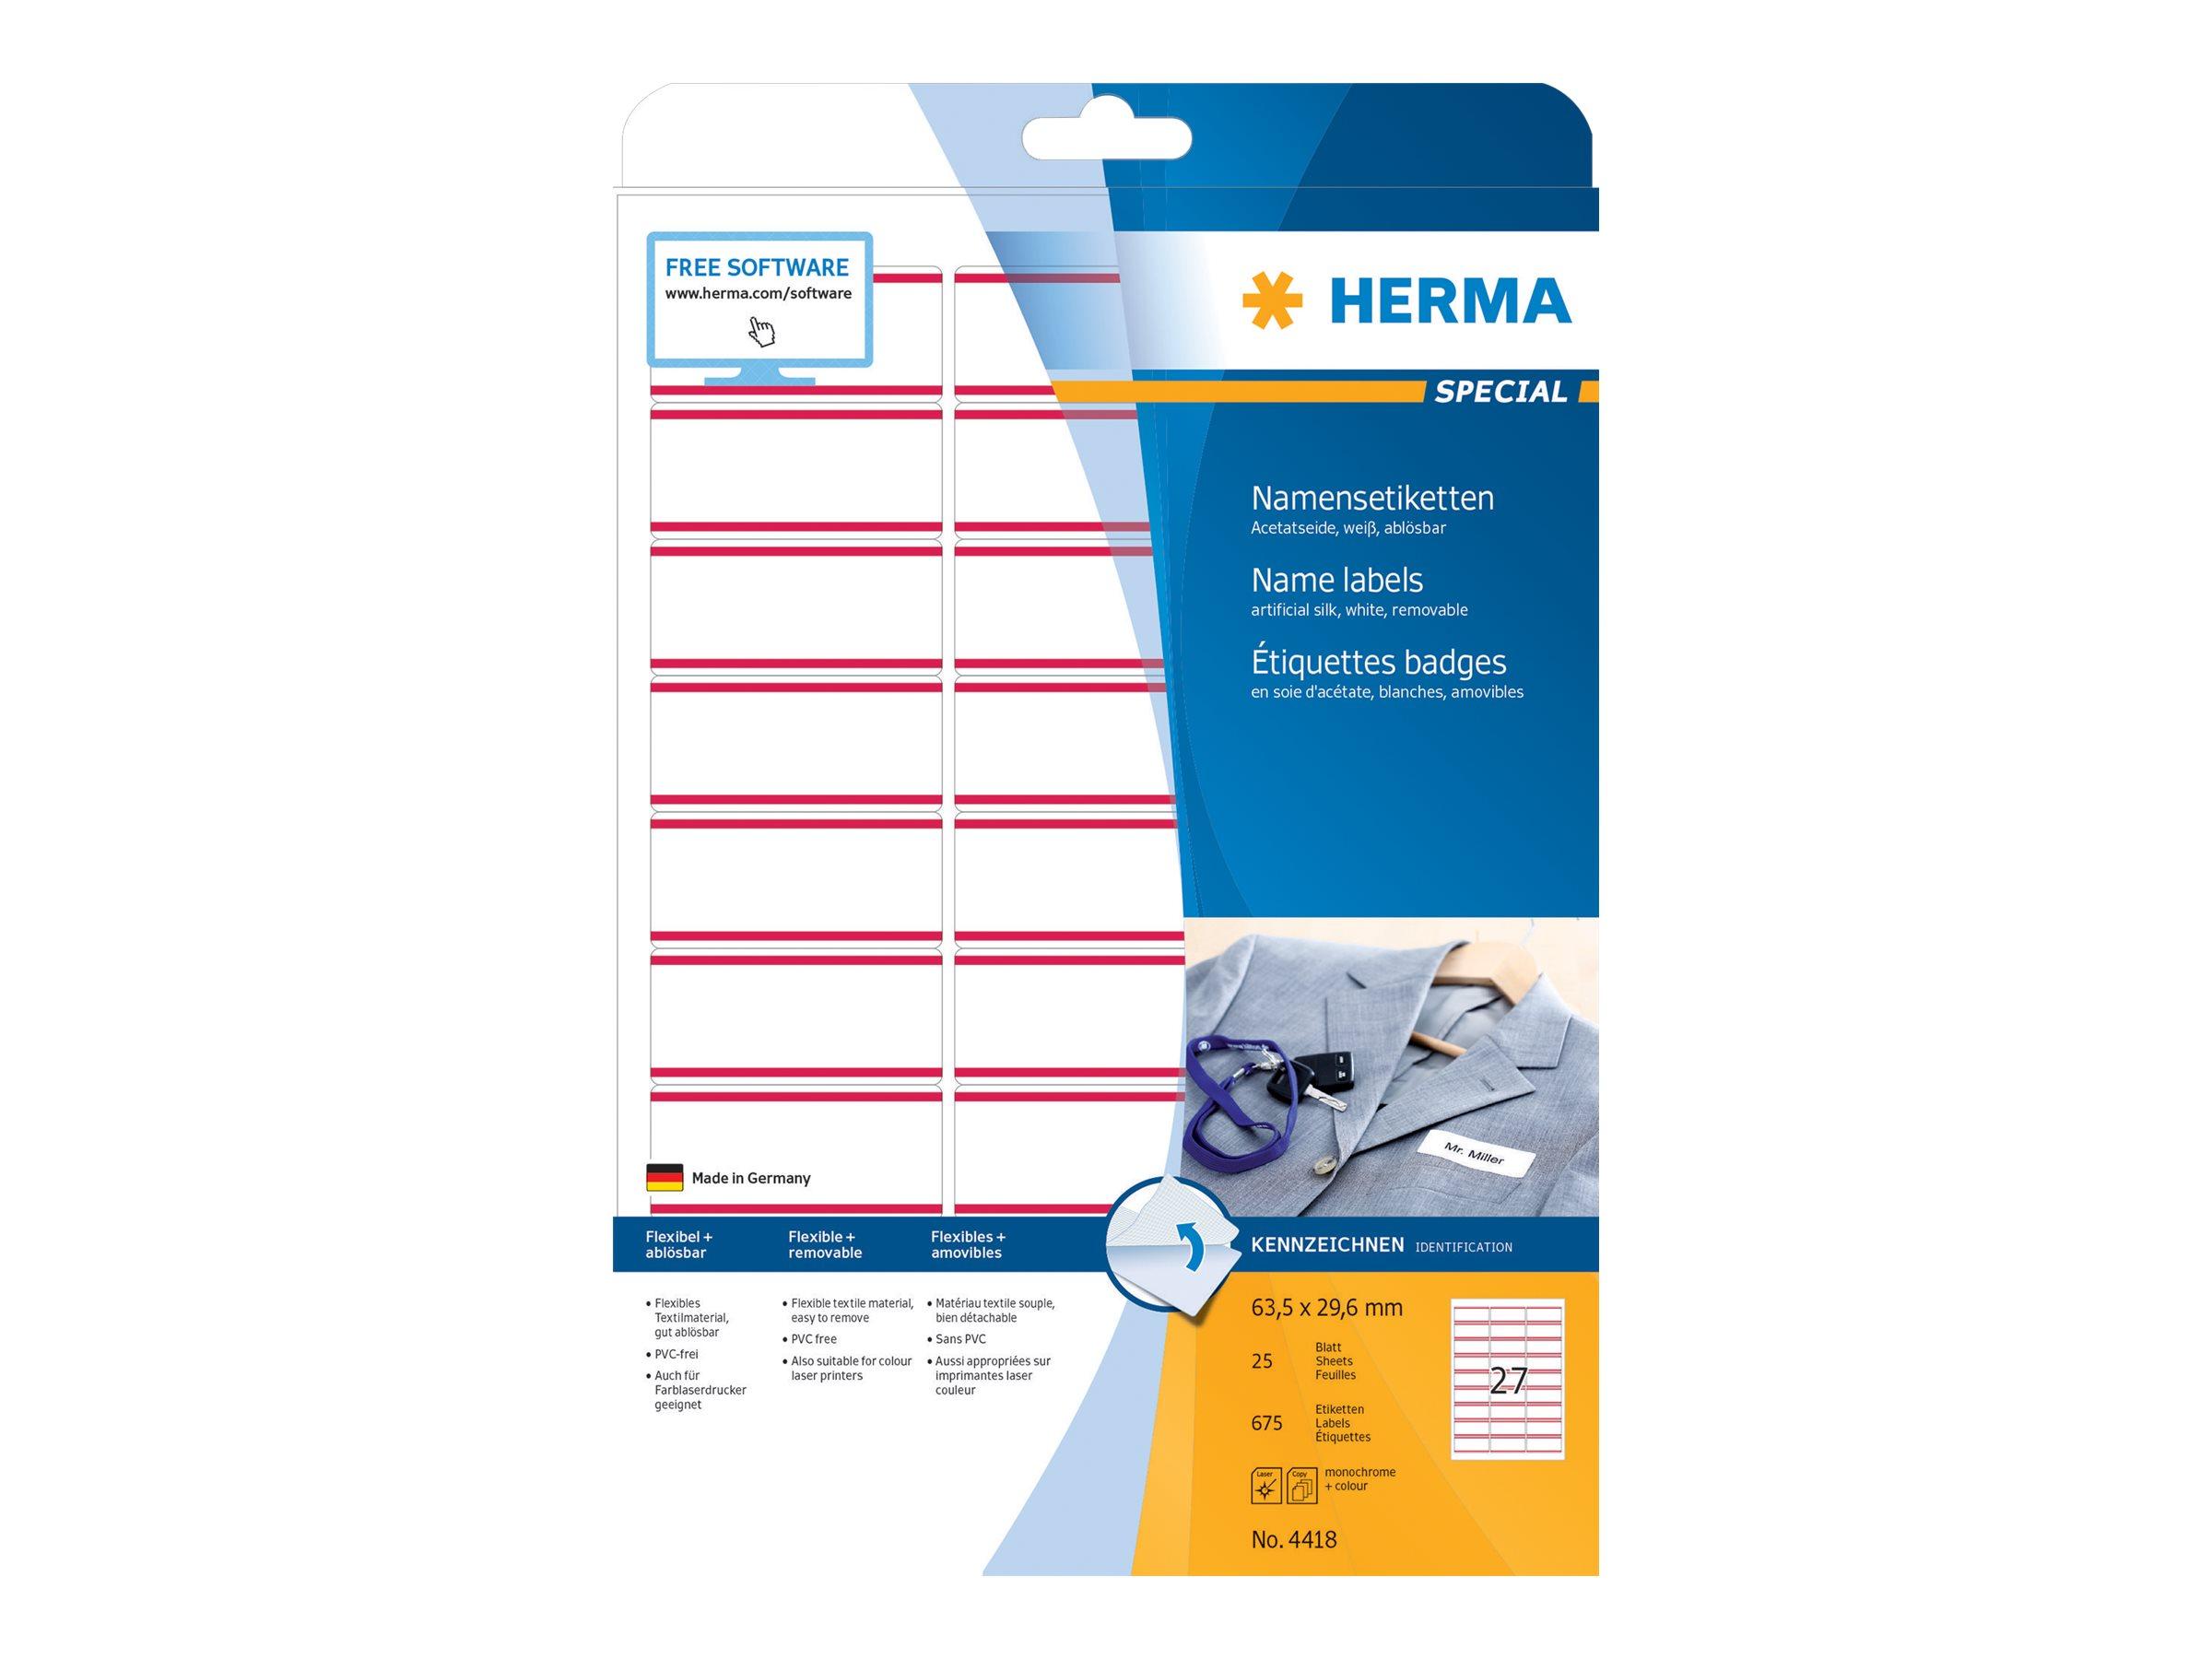 HERMA Special - Seidig - selbstklebend, entfernbarer Klebstoff